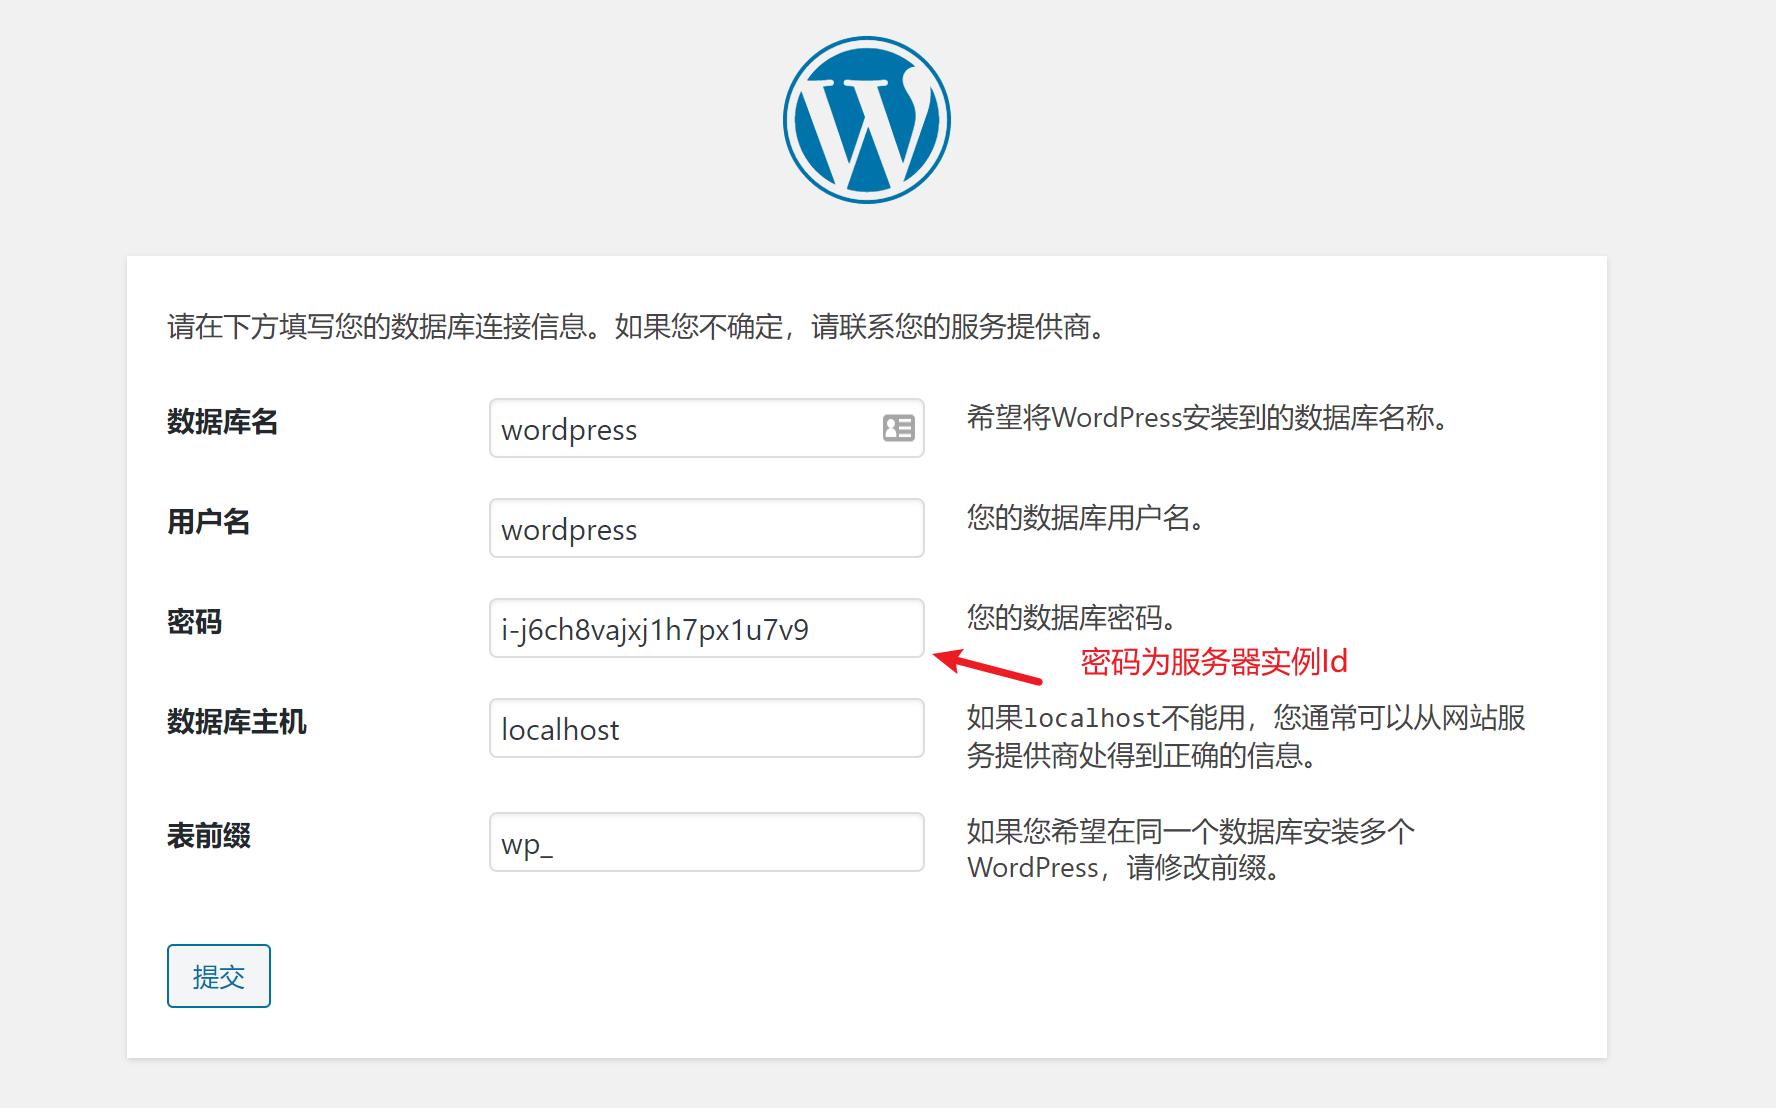 WordPress-2020-12-07-10-19-45